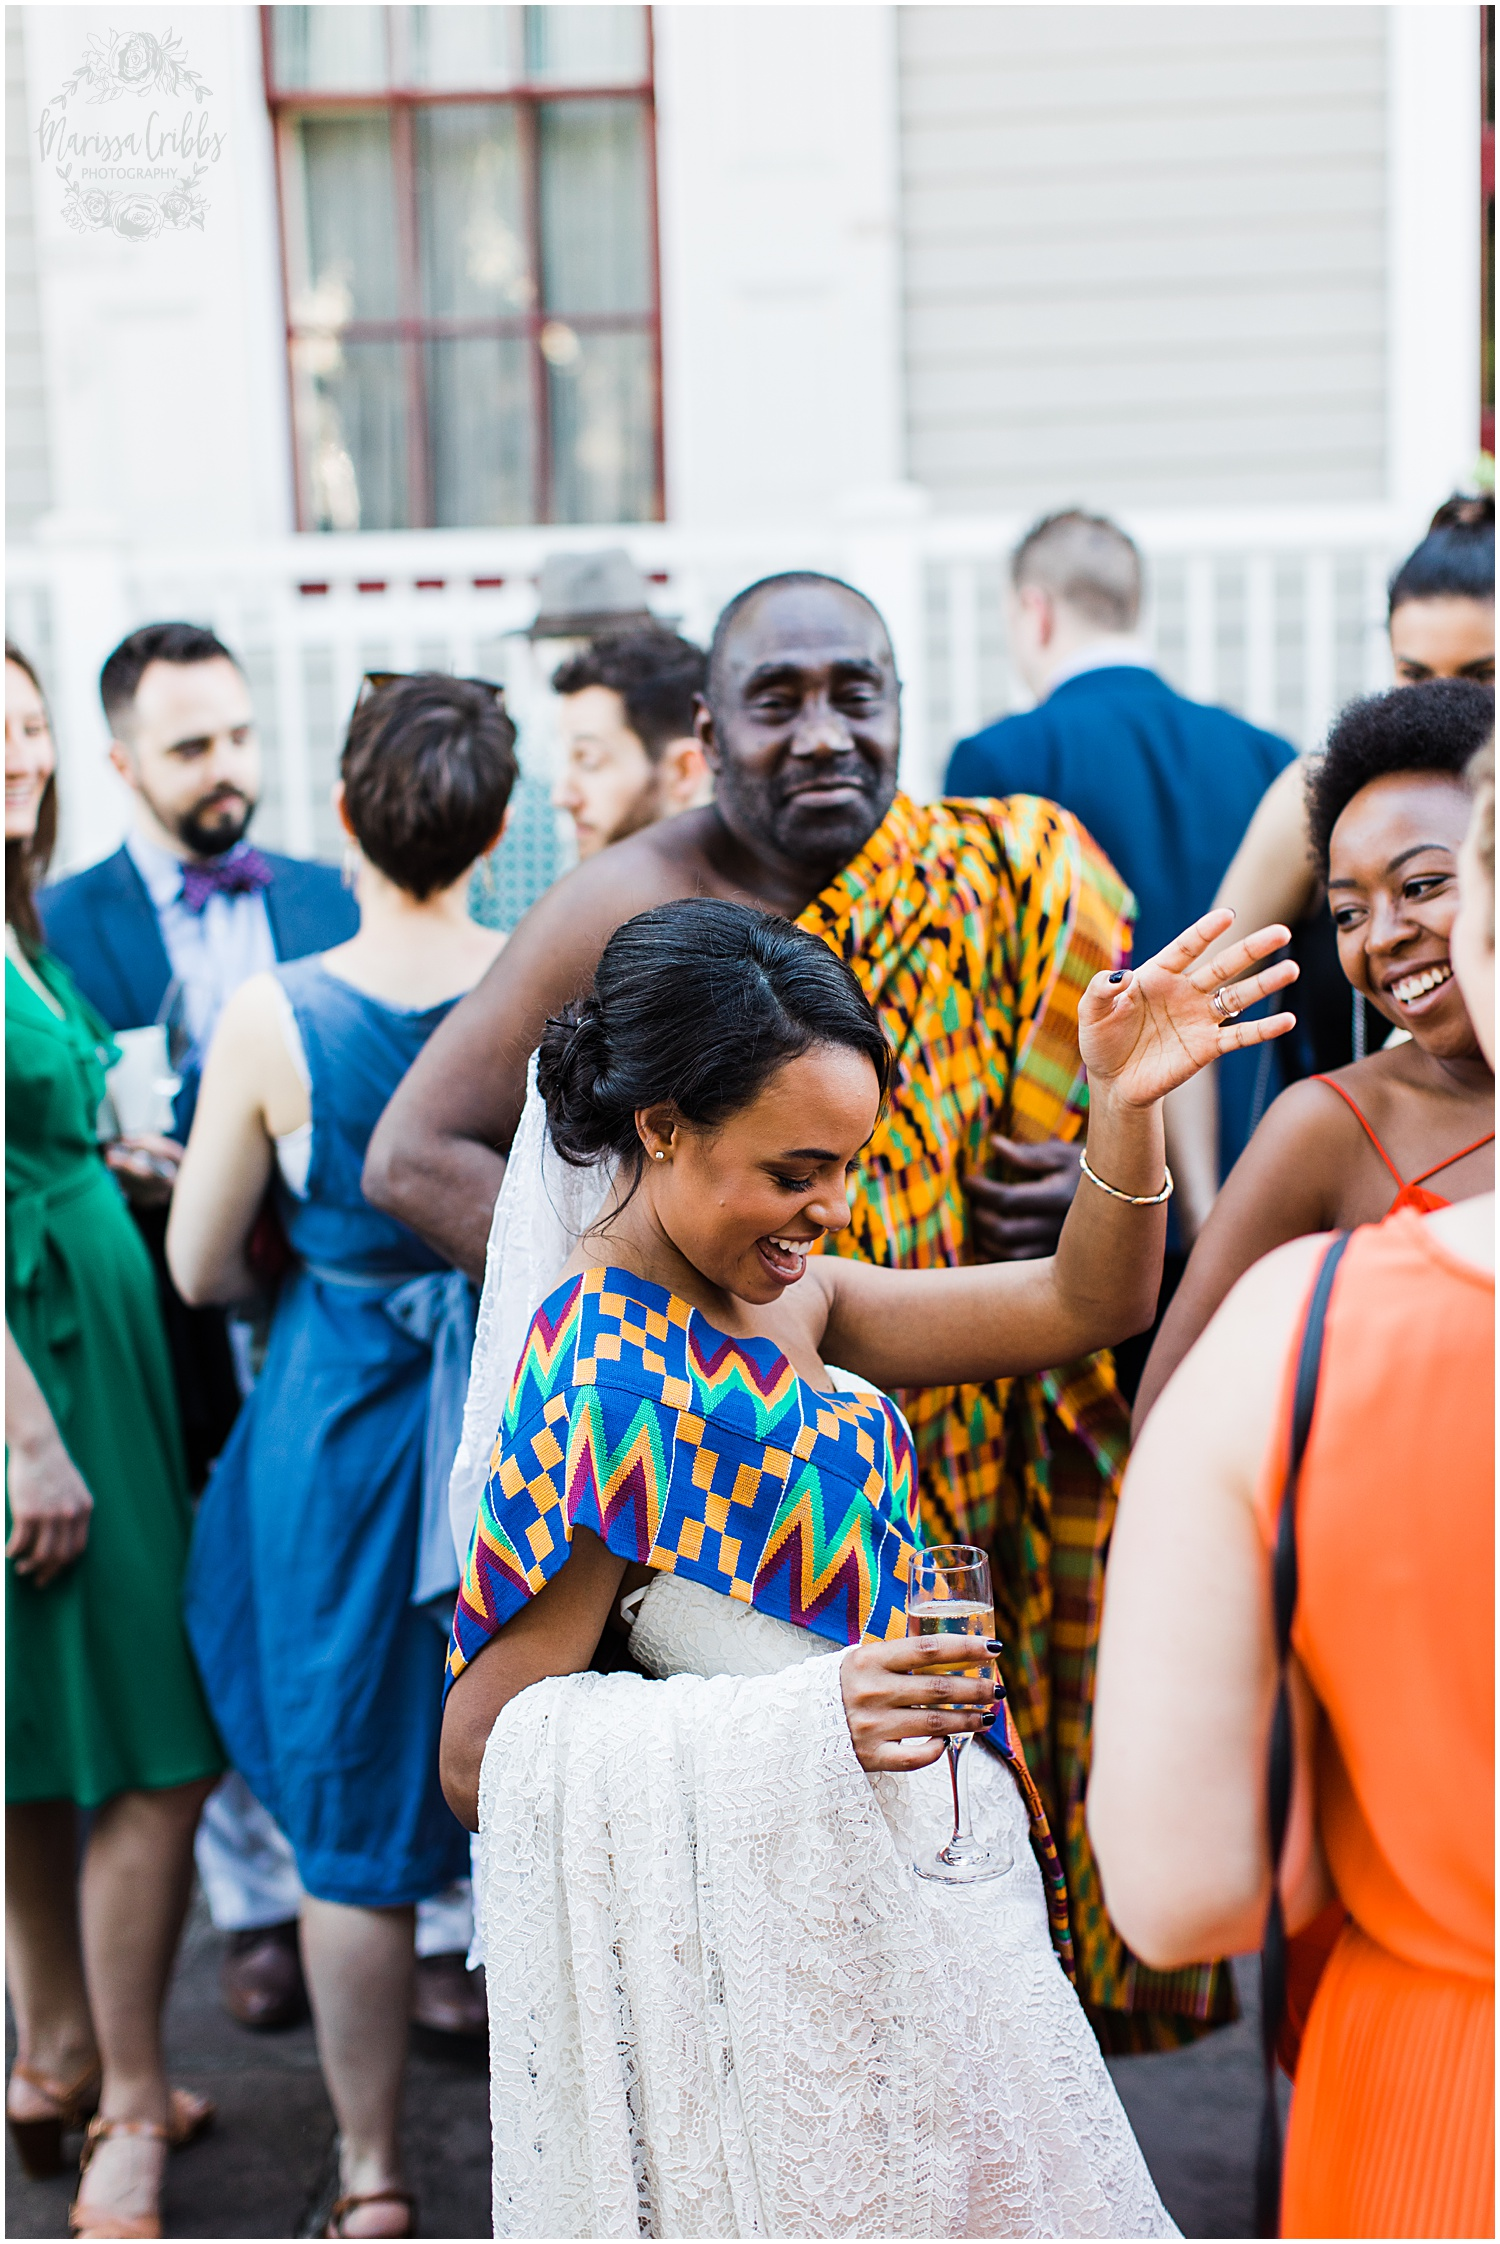 NEW ORLEANS WEDDING   BENACHI HOUSE   SARAH & MICHAEL   MARISSA CRIBBS PHOTOGRAPHY_4493.jpg